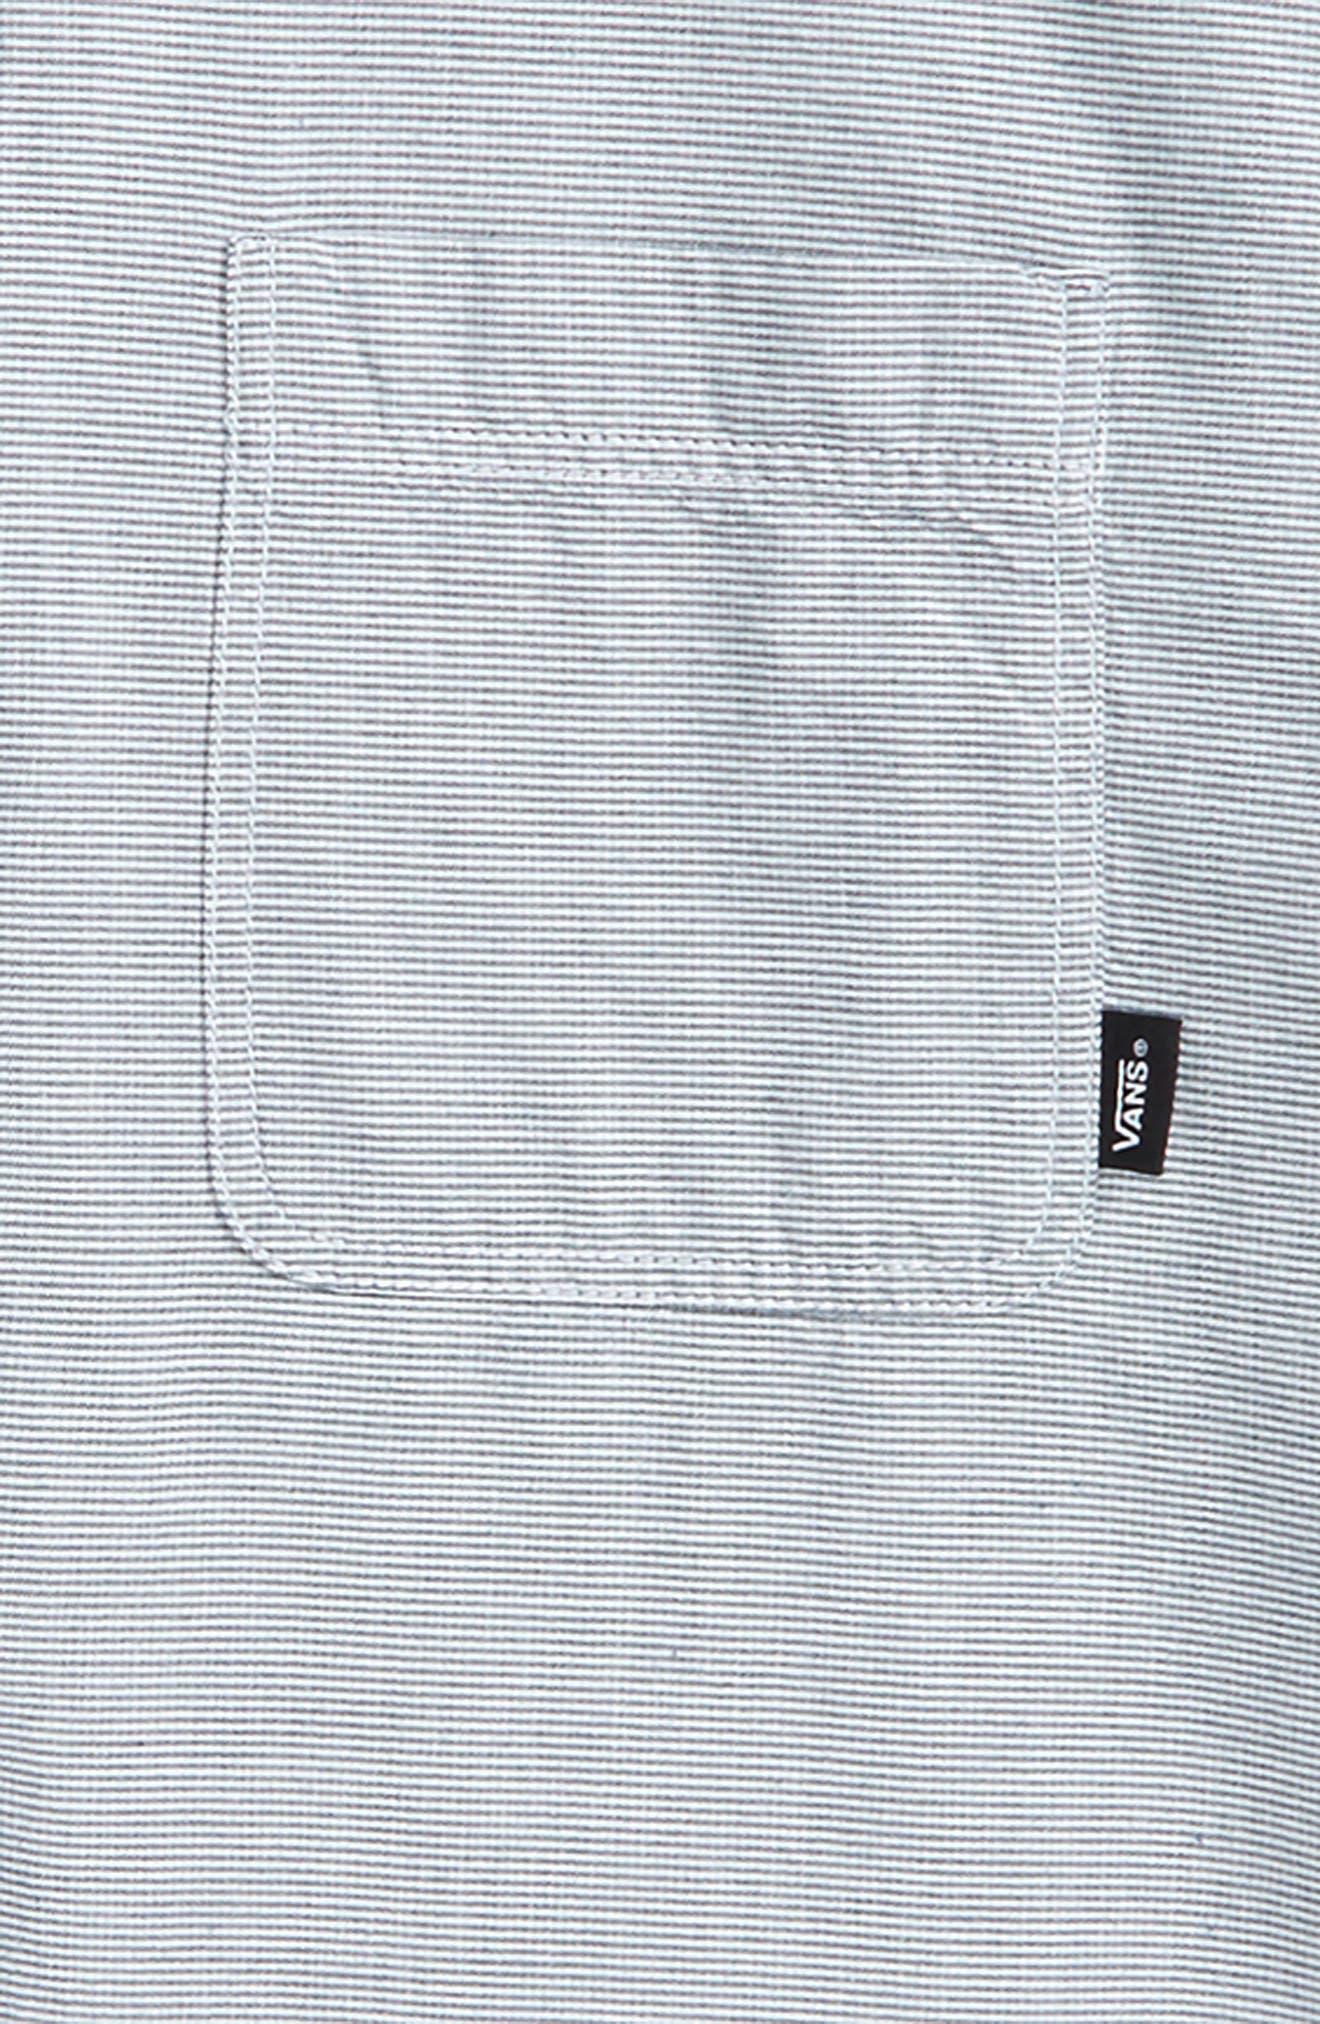 Wexford Woven Shirt,                             Alternate thumbnail 2, color,                             401